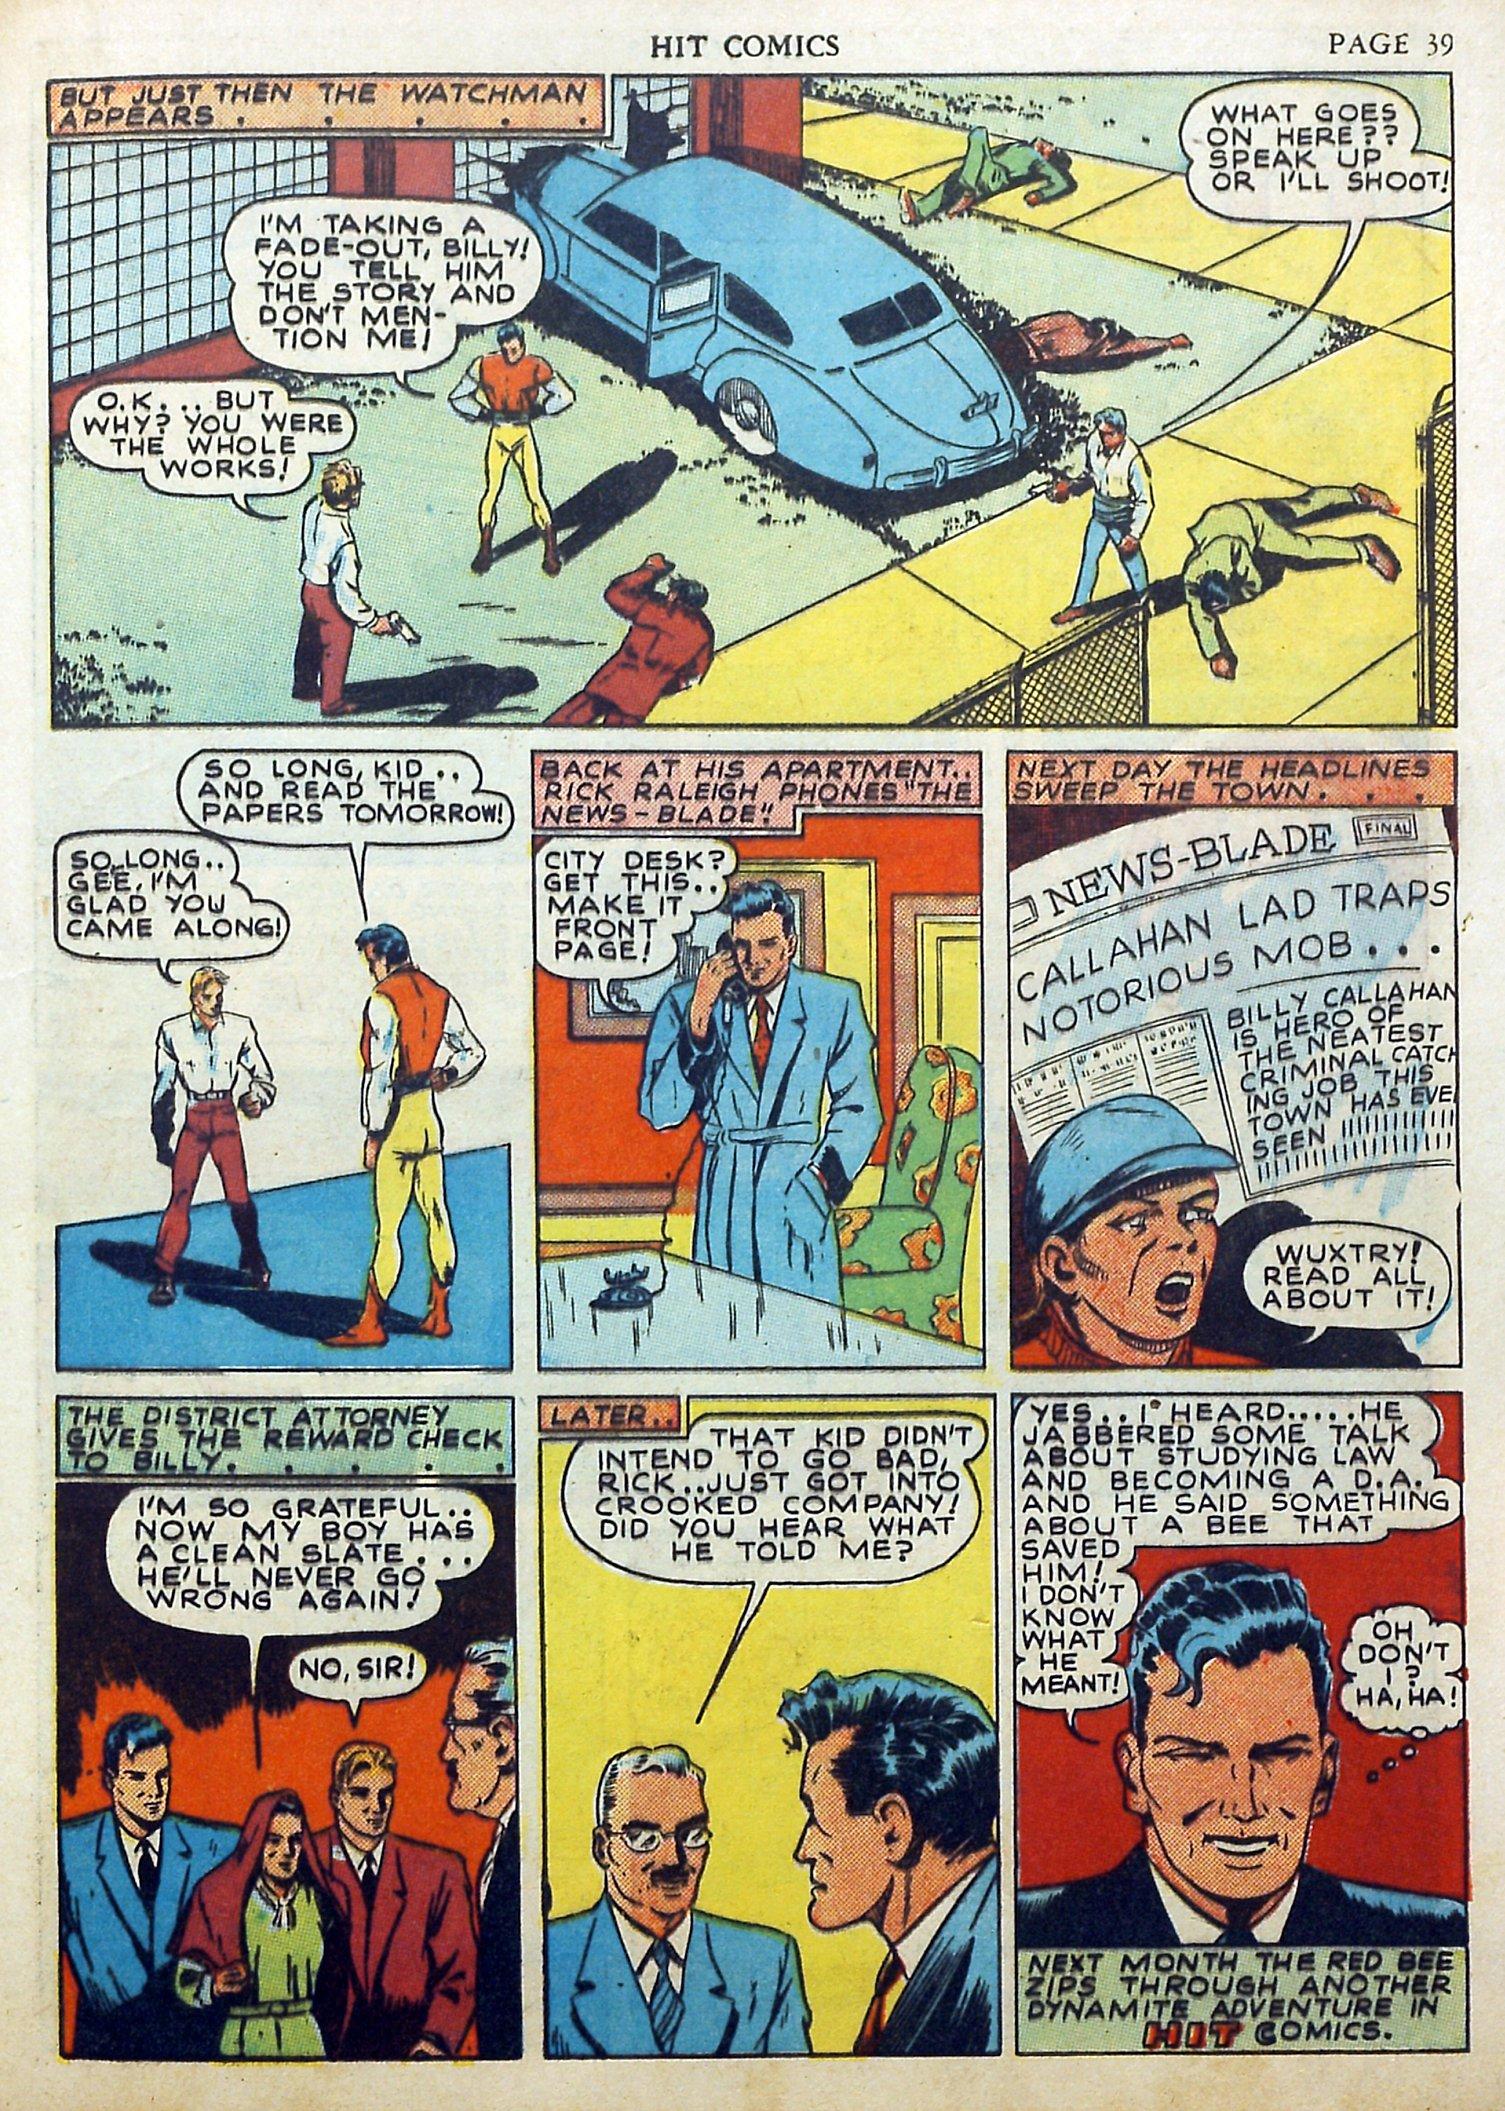 Read online Hit Comics comic -  Issue #17 - 41